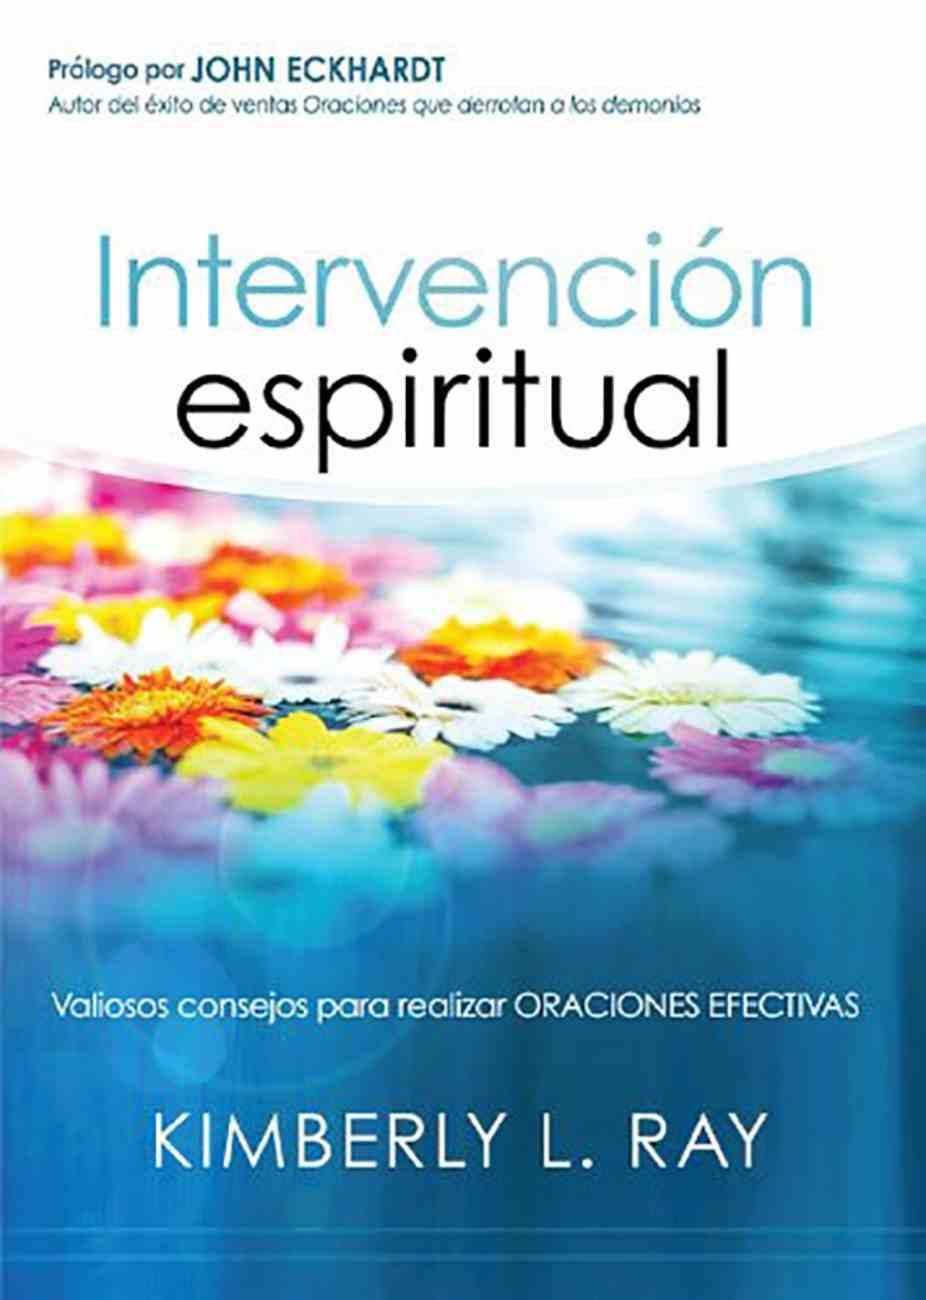 Intervencion Espiritual (Spiritual Intervention) Paperback